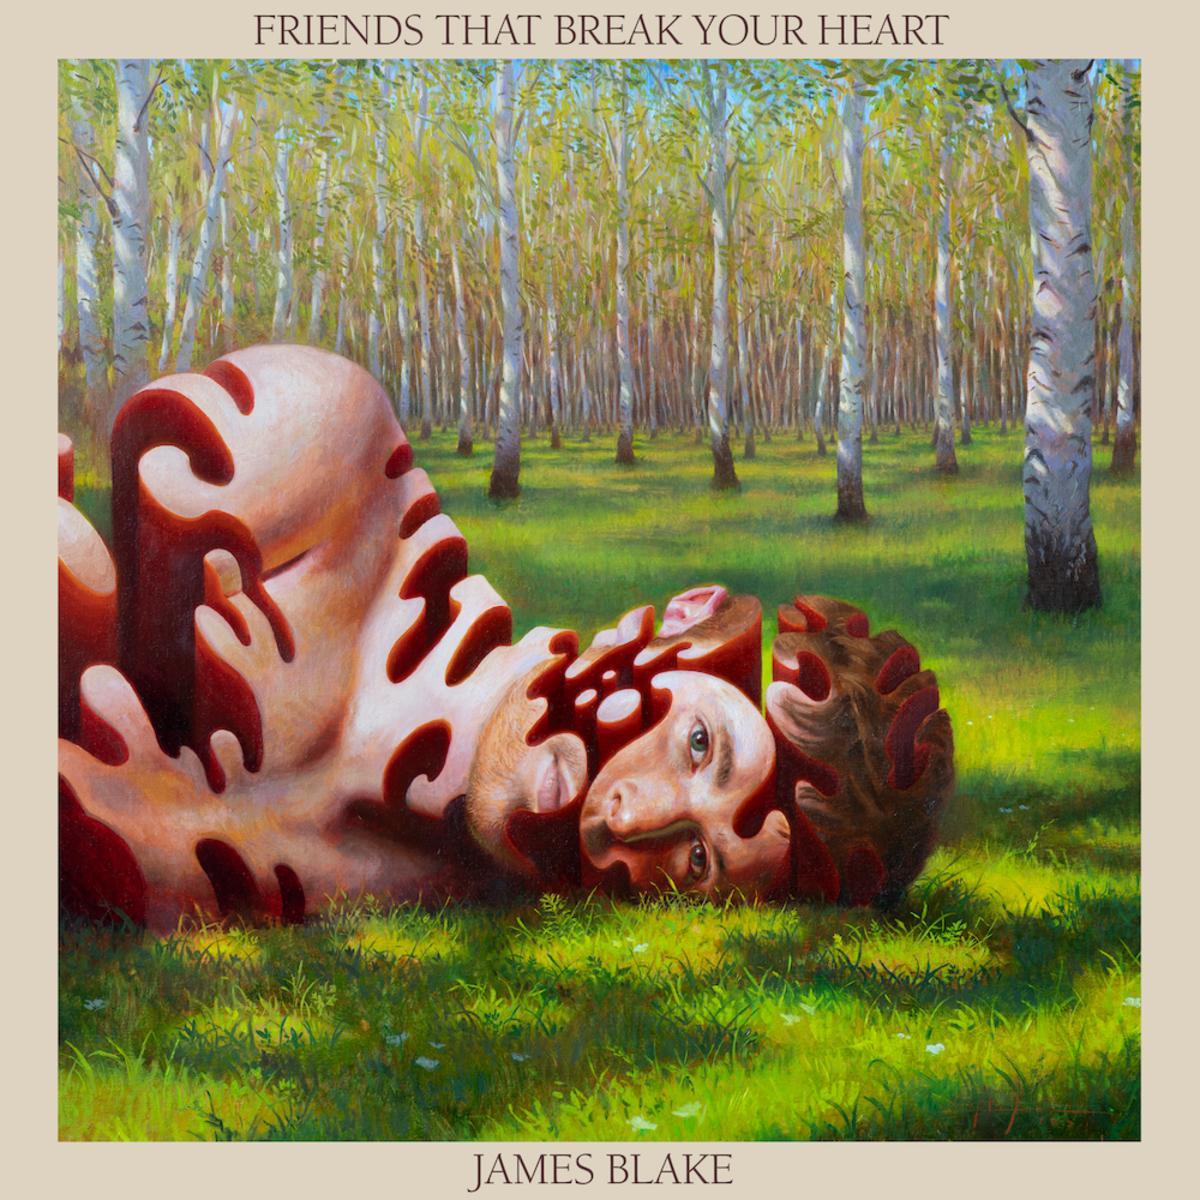 MP3: James Blake - Life Is Not The Same